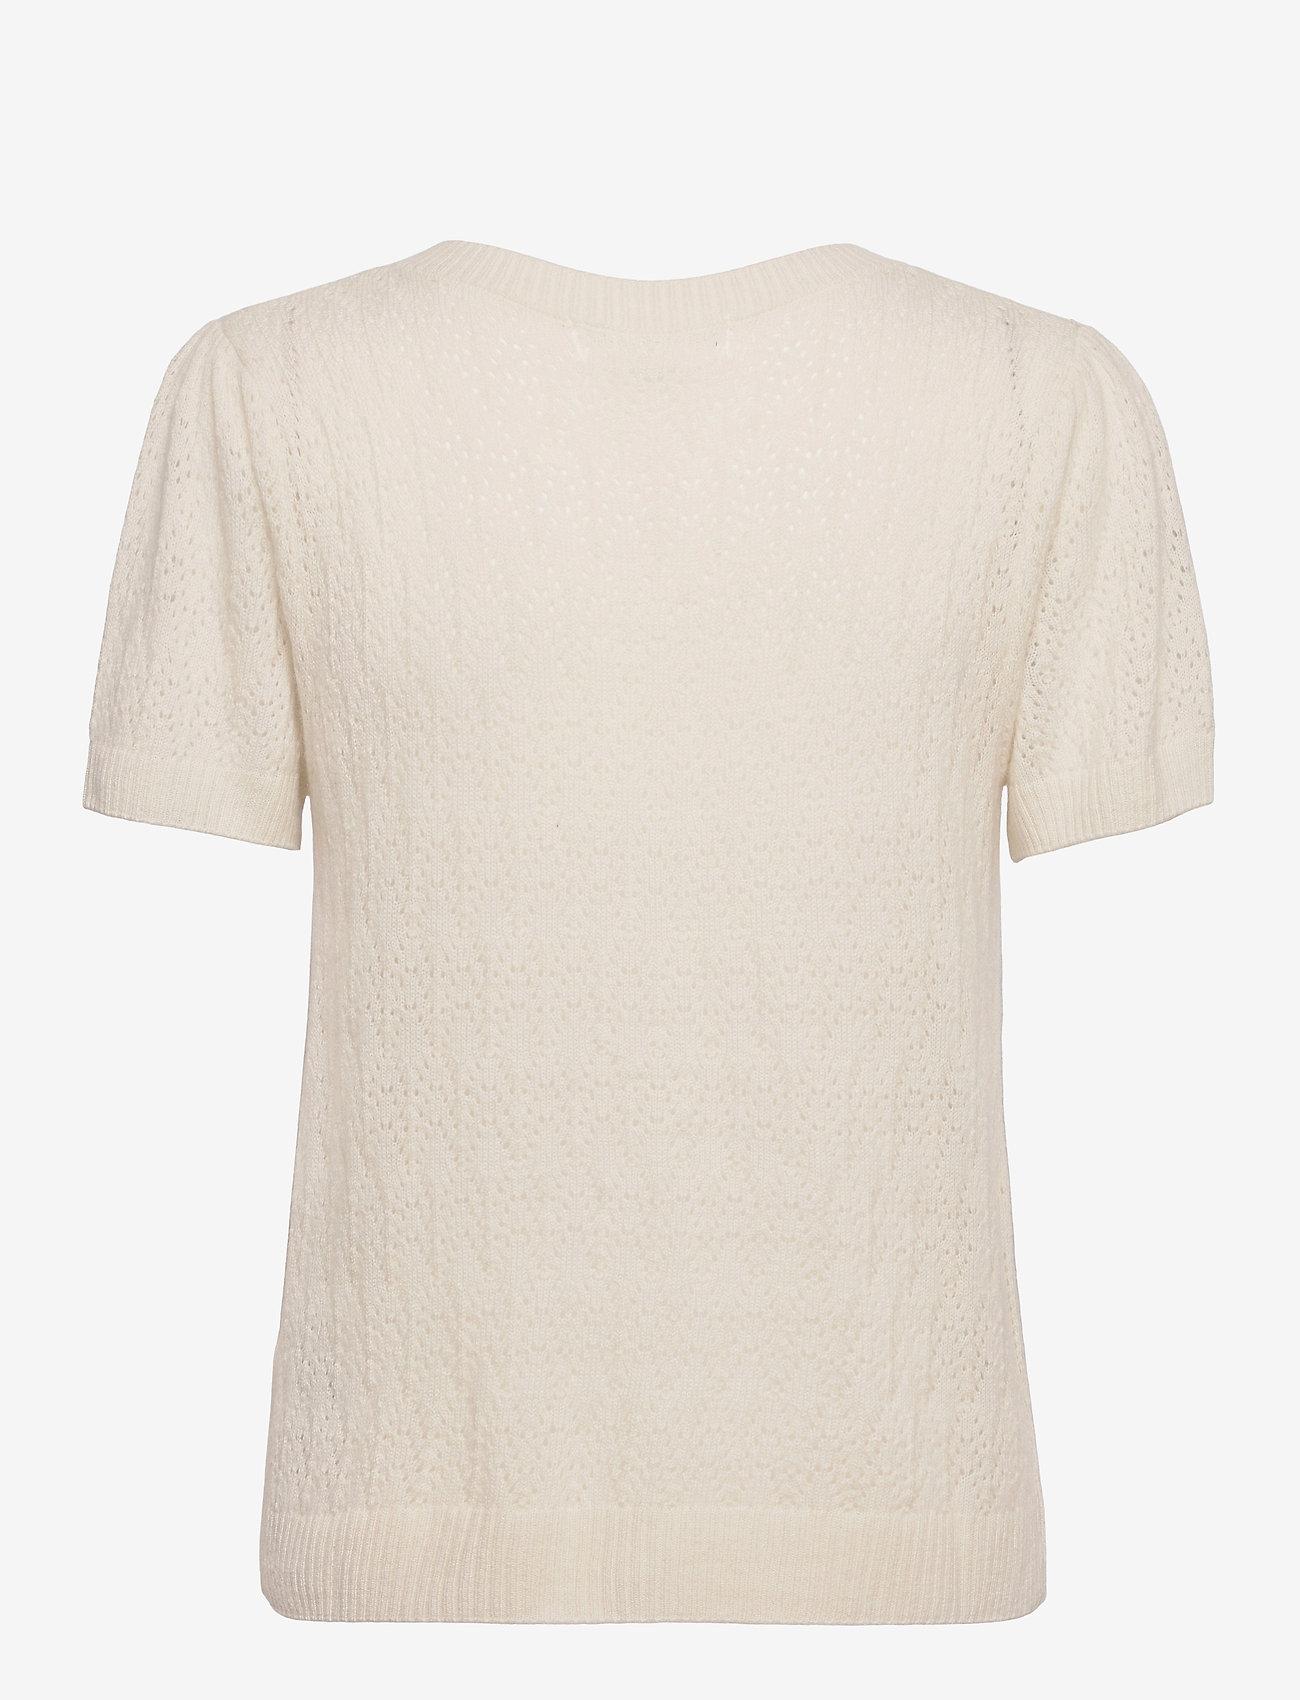 Rosemunde - Wool & cashmere cardigan ss - strikkede toppe - ivory - 1